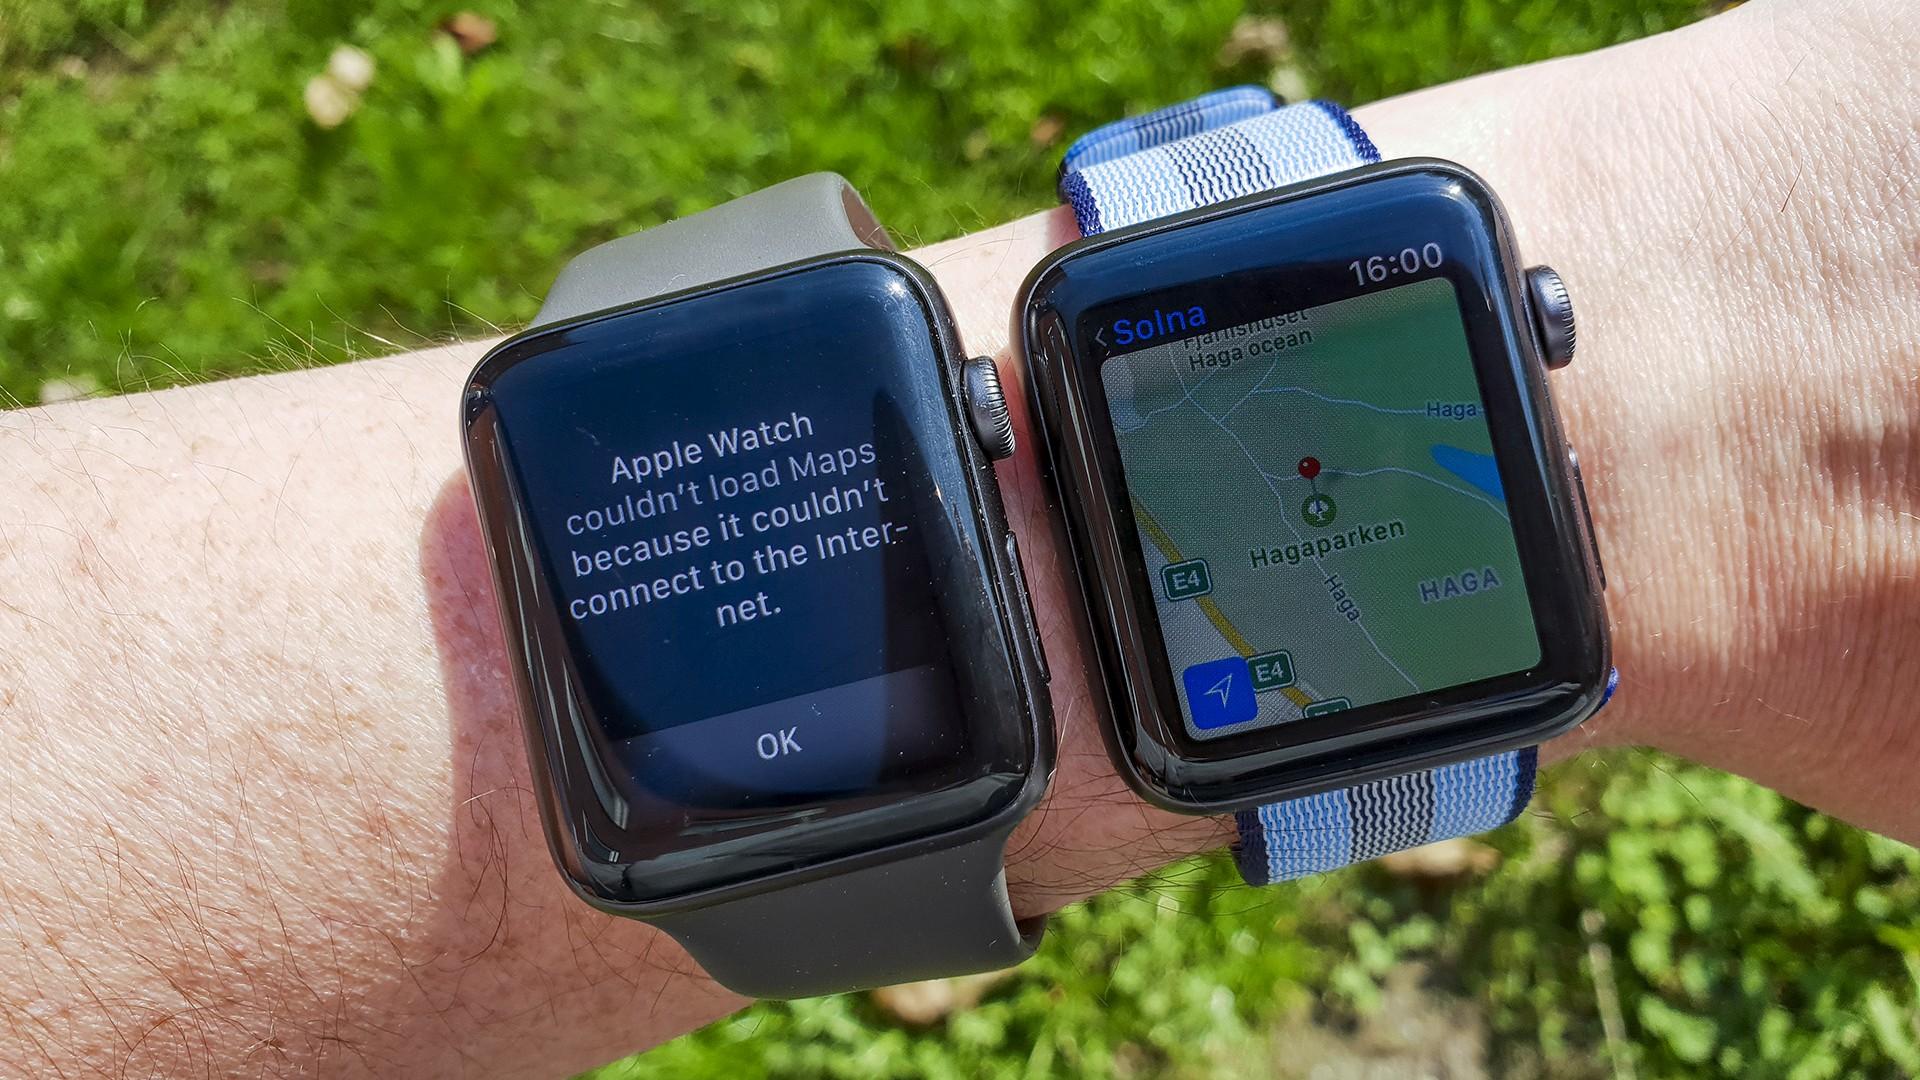 Apple Watch 3 vs Cellular